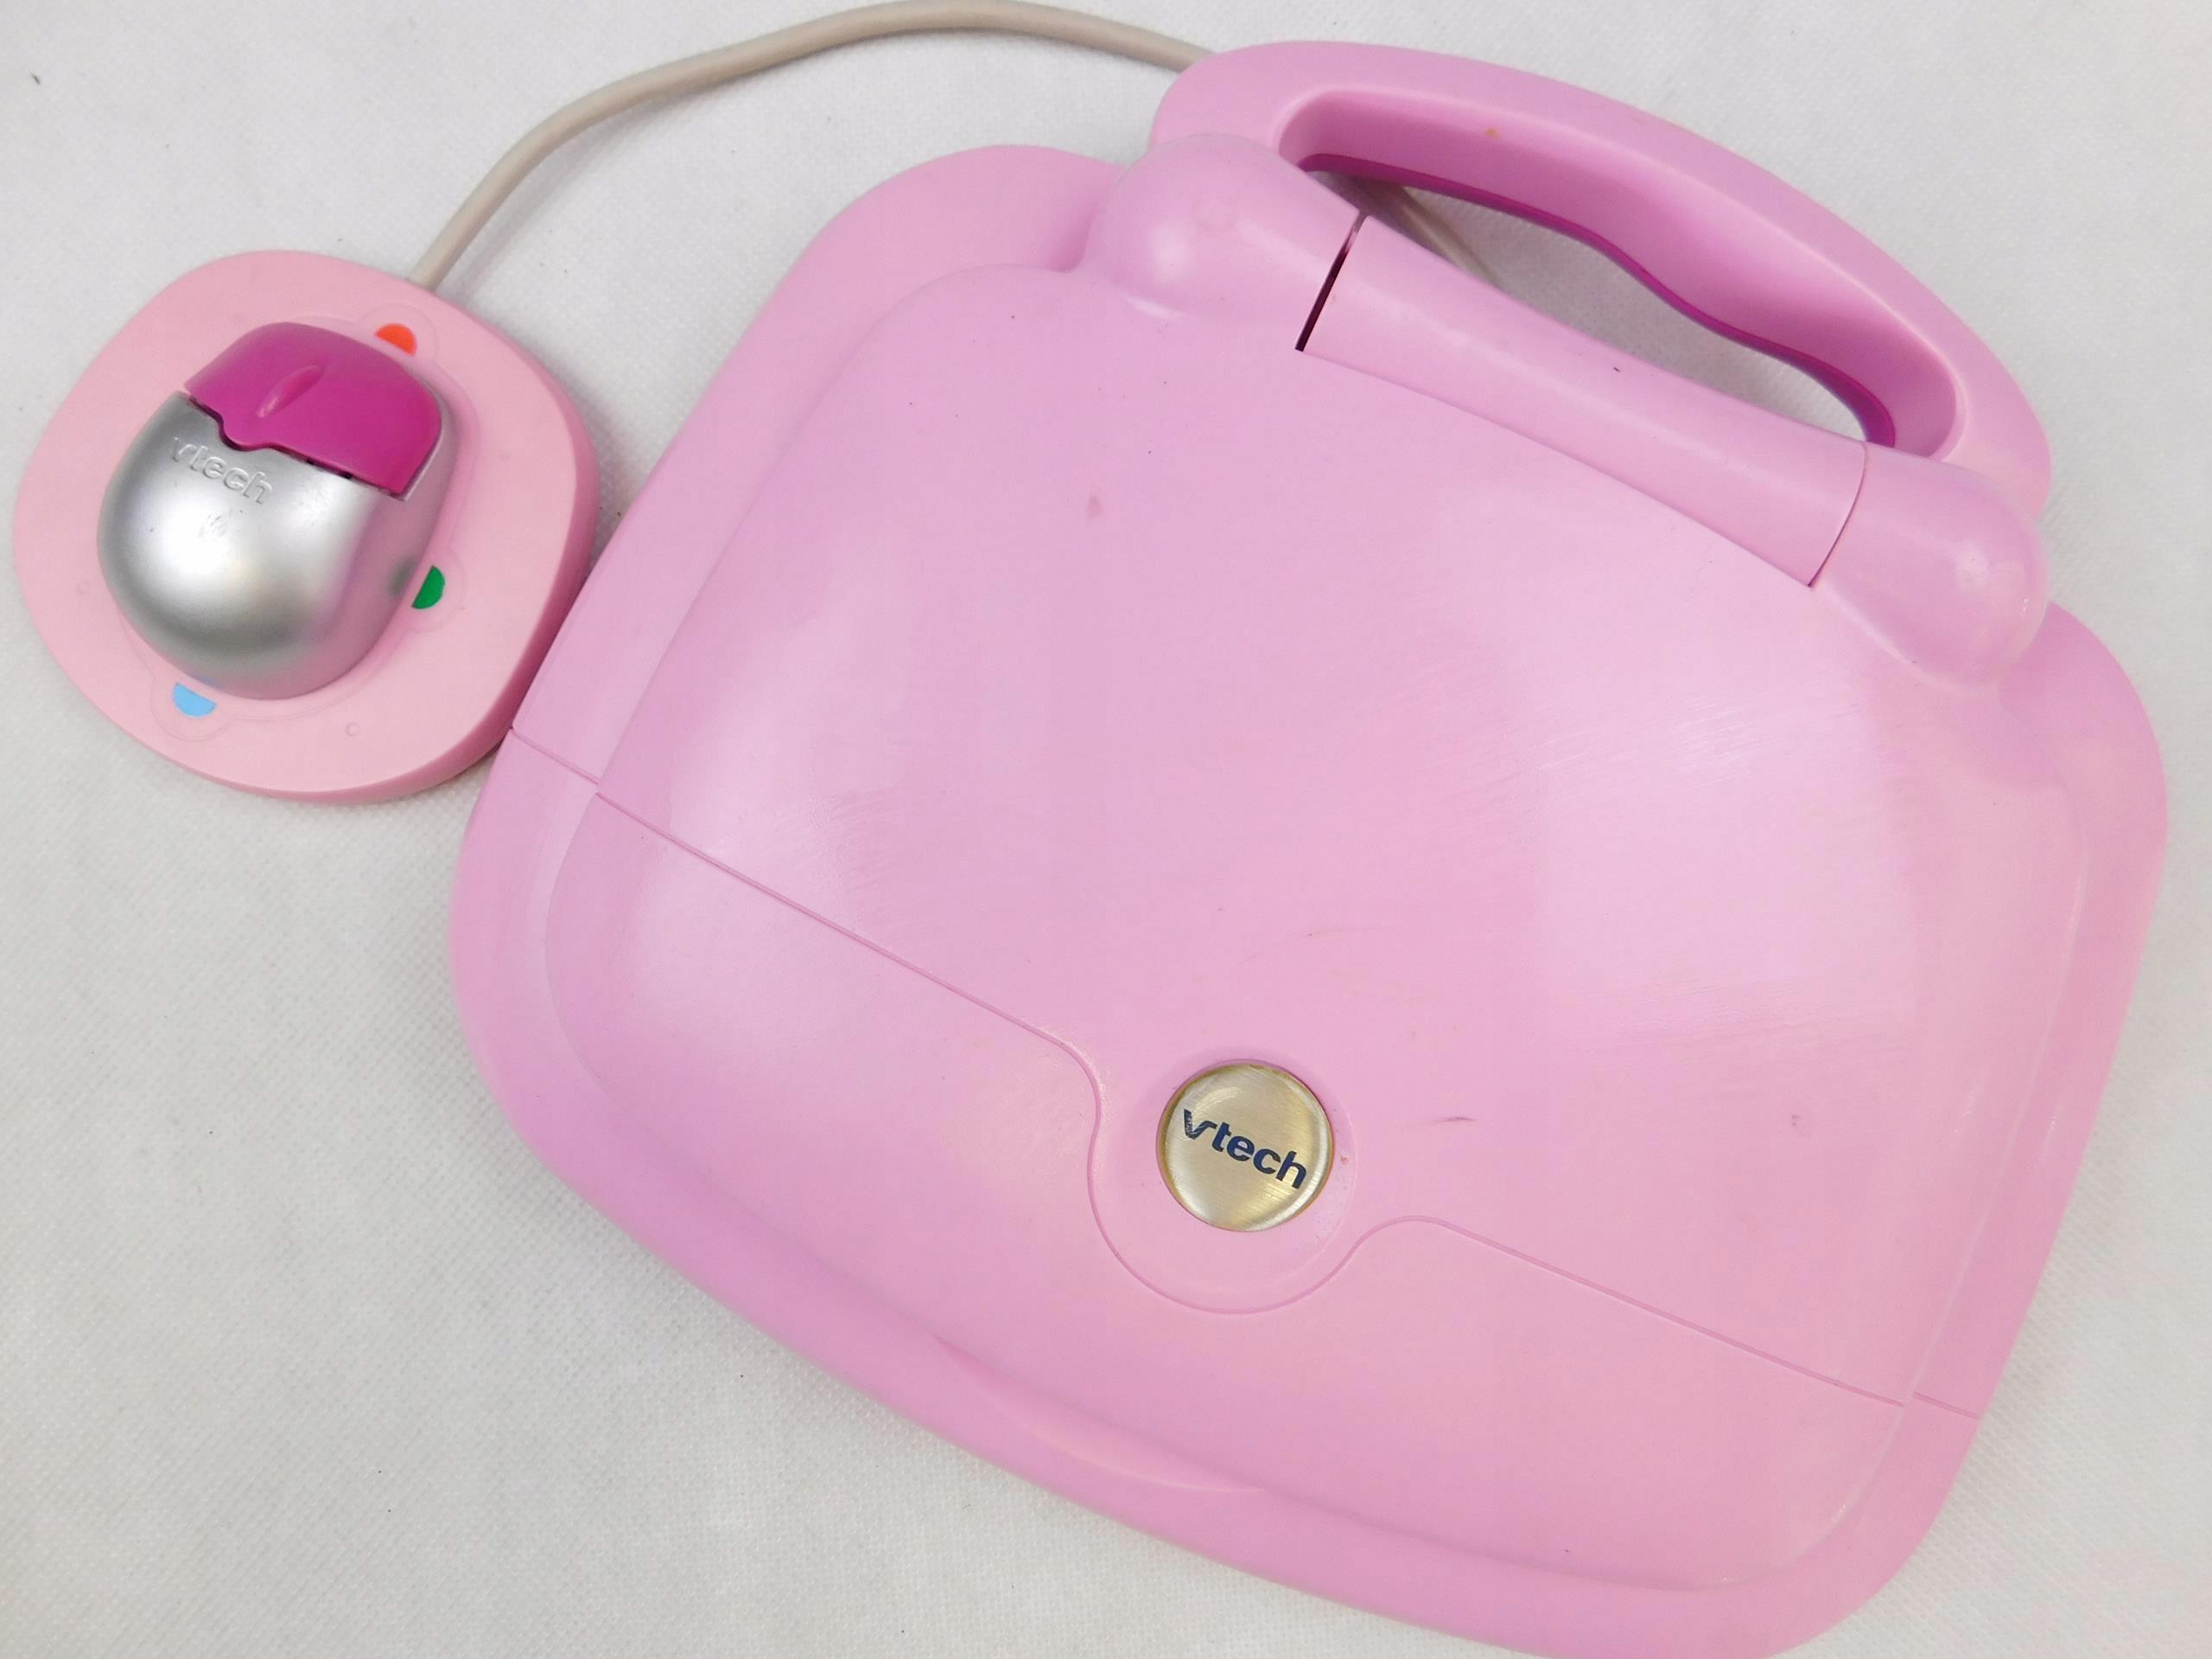 VTECH edukacyjna ZABAWKA interaktywna LAPTOP pink